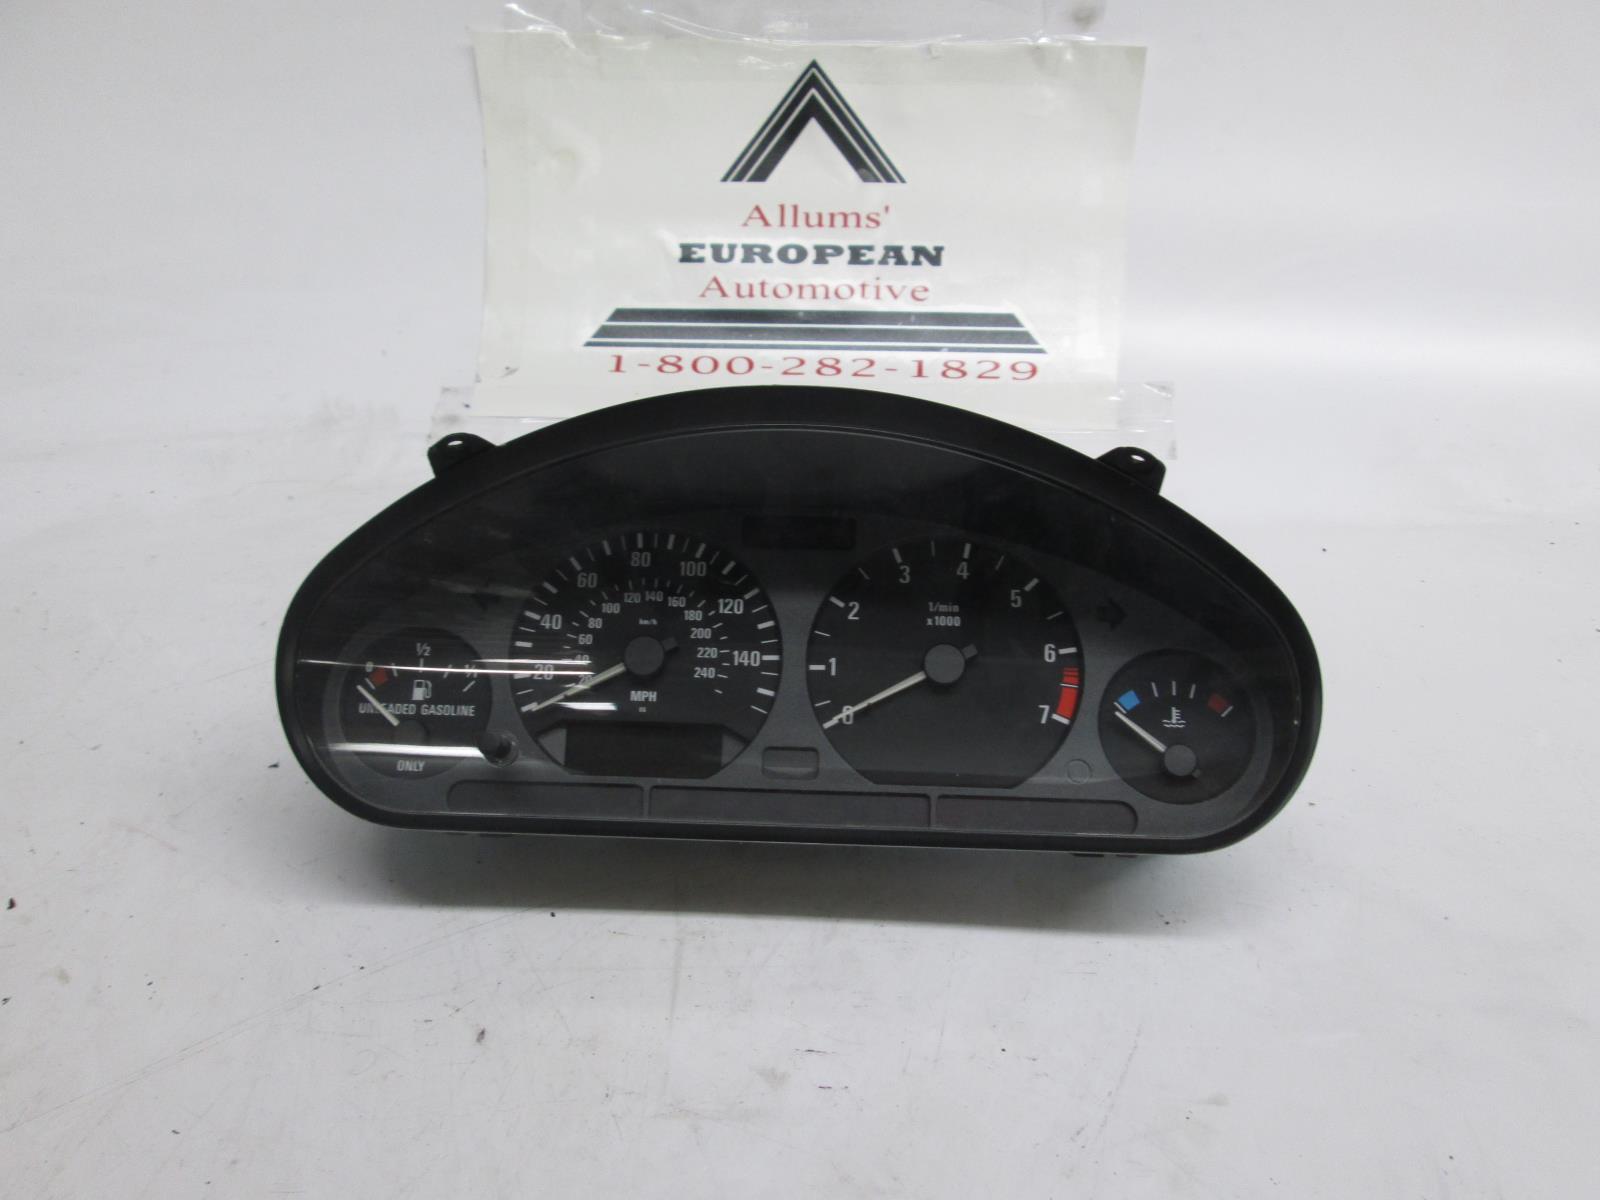 BMW E36 325i 328i 323i speedometer instrument cluster 62118371562 #3